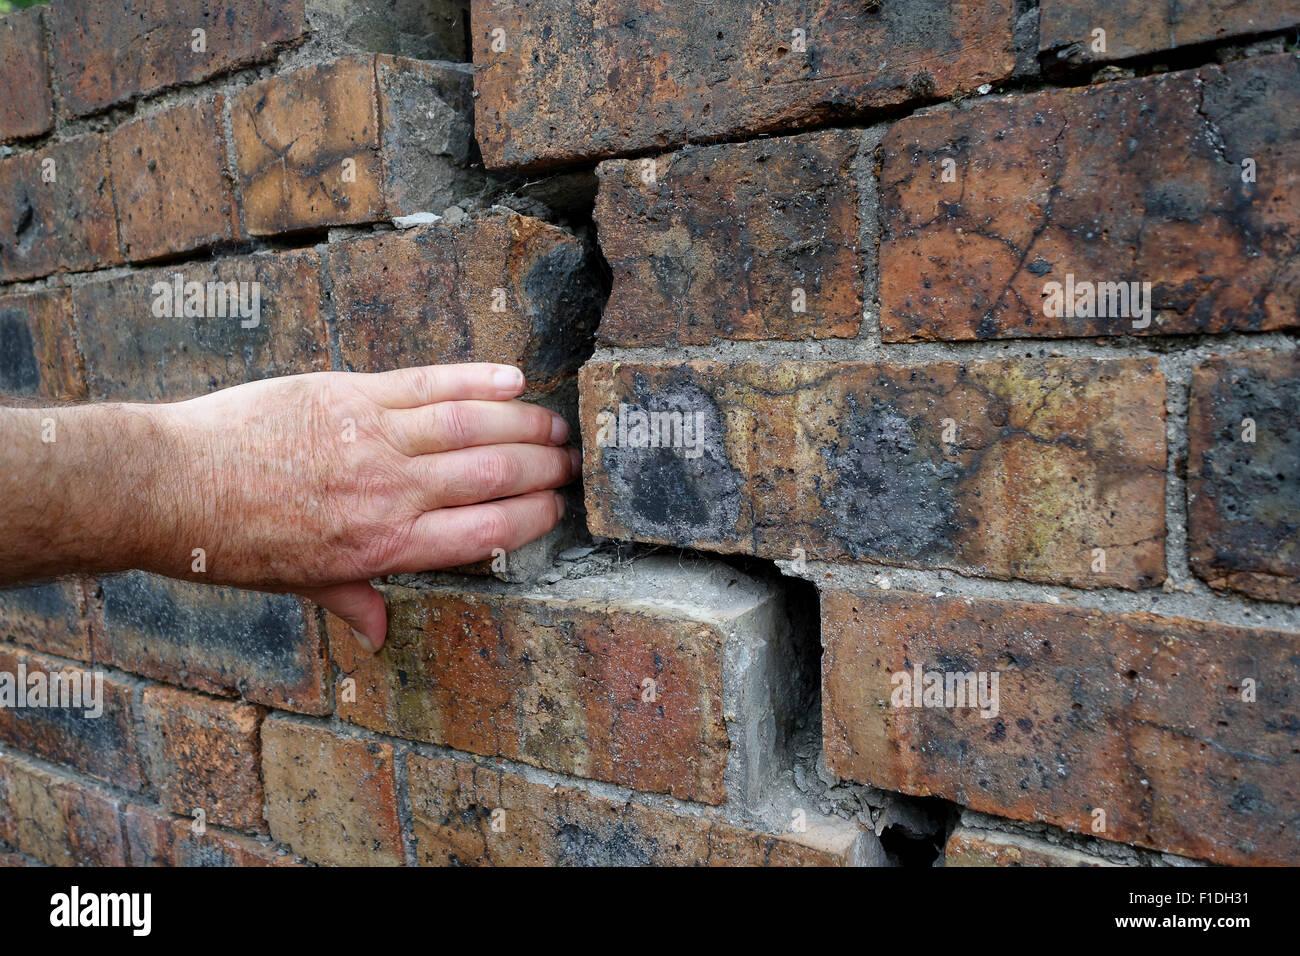 Old brick wall subsidence crack cracks subsiding walls - Stock Image